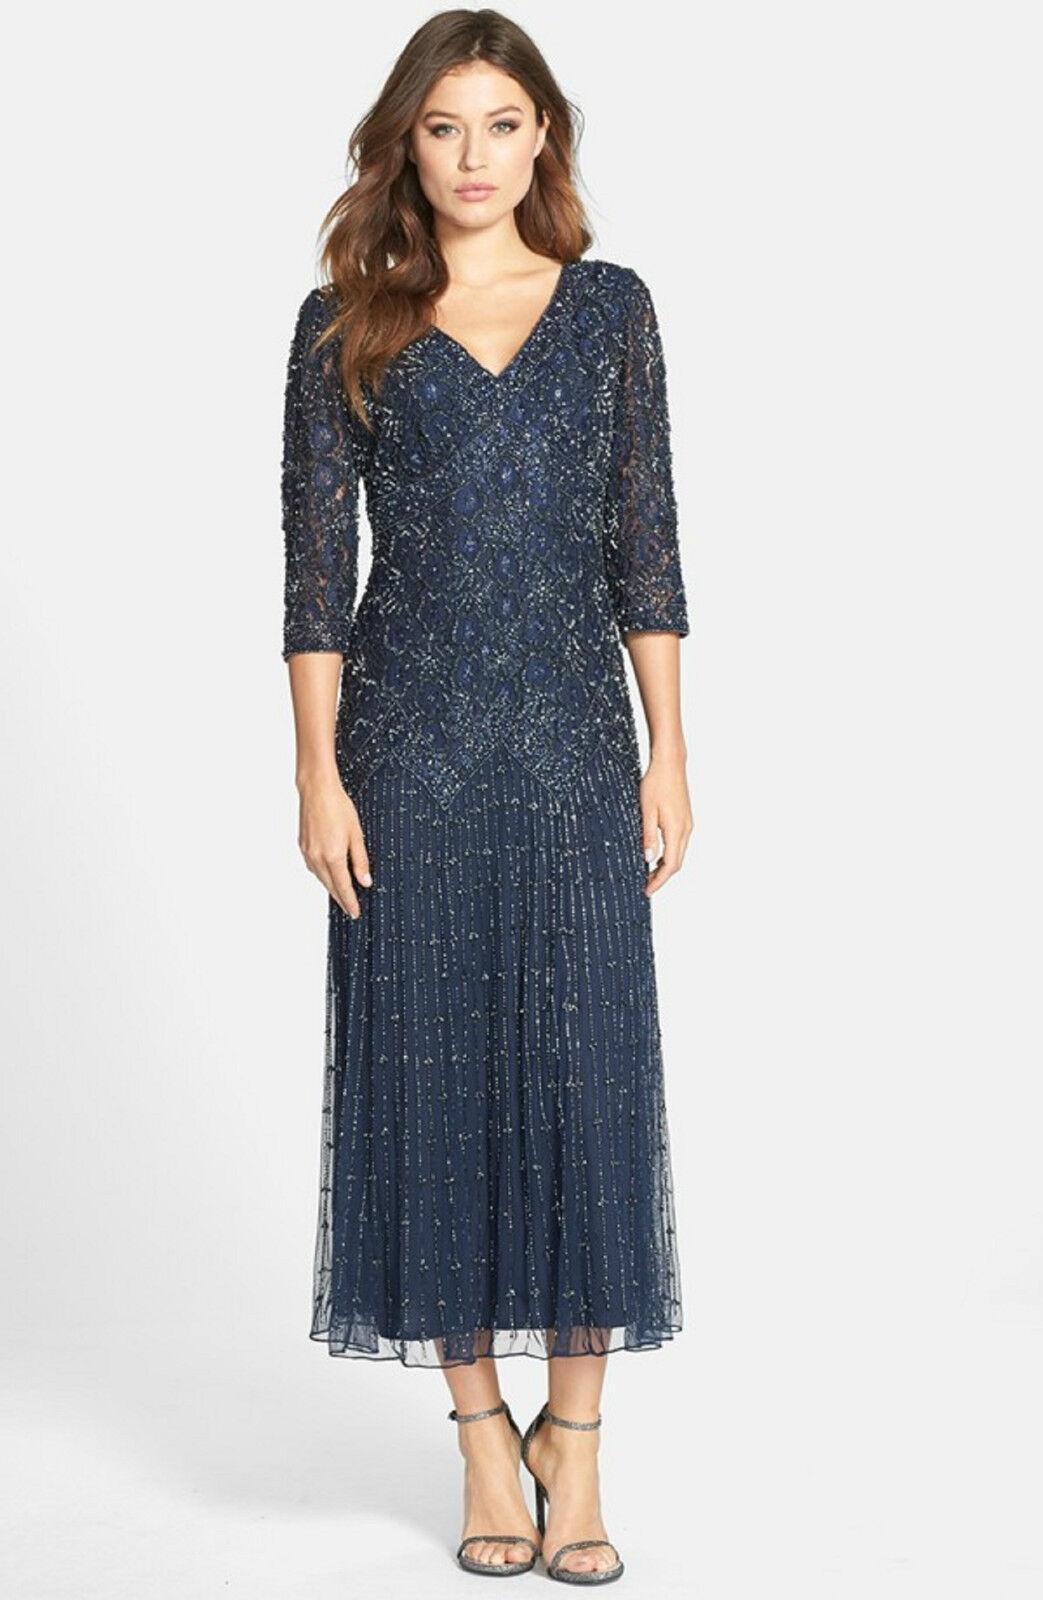 New PISARRO NIGHTS Beaded V Neck Mesh Dress Navy Blau 3 4 Sleeve Größe 4